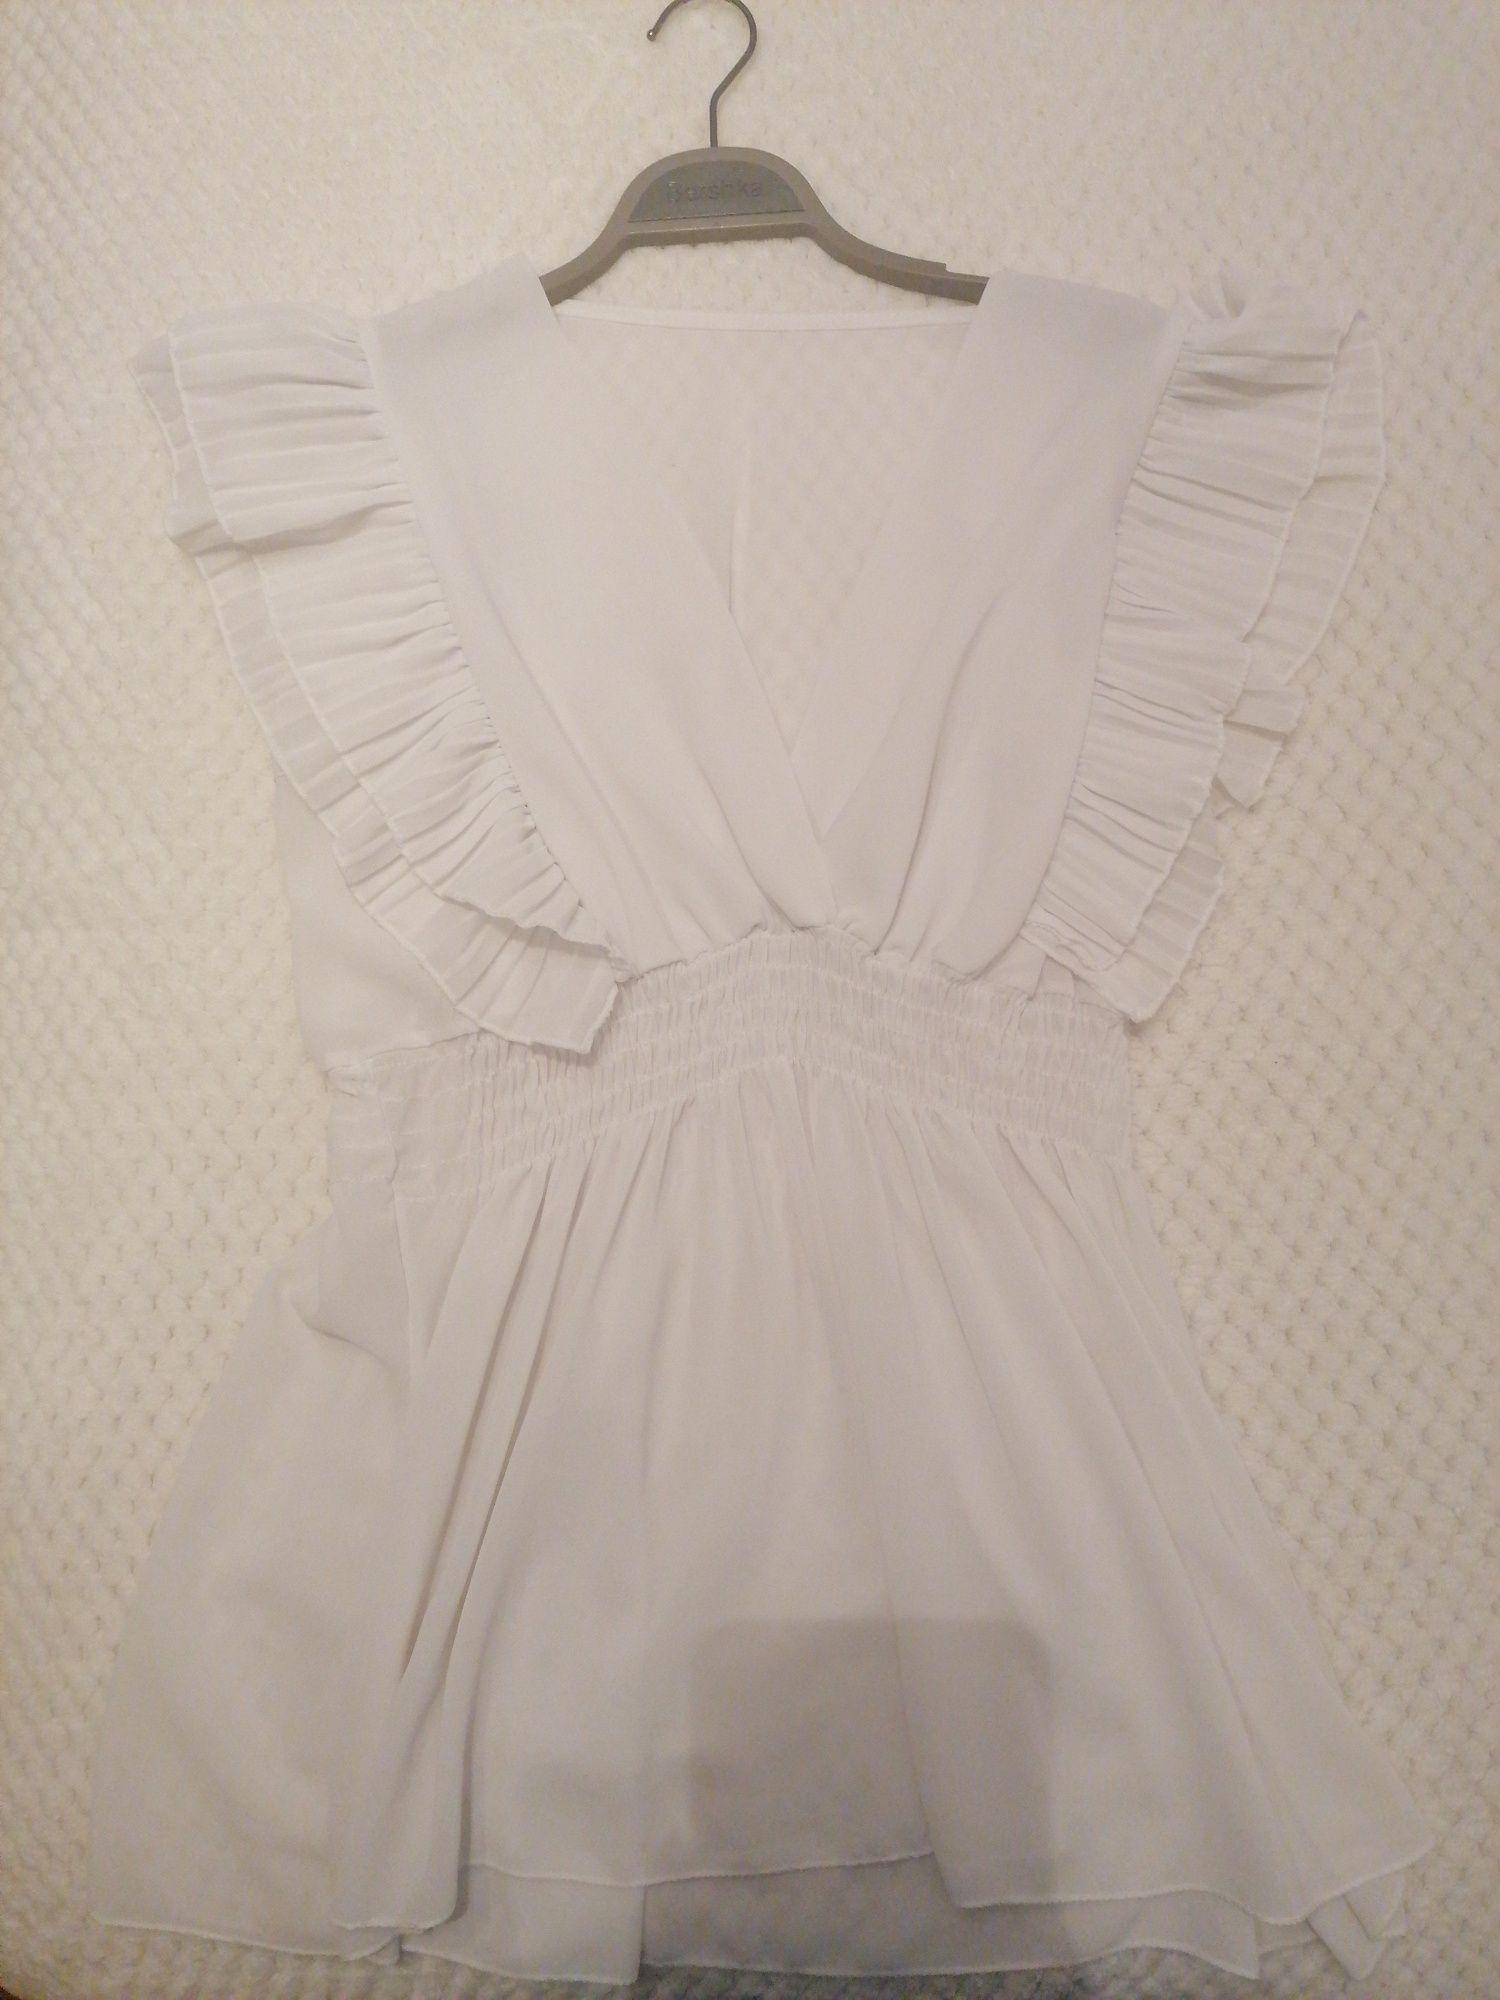 Blusa branca tamanho S